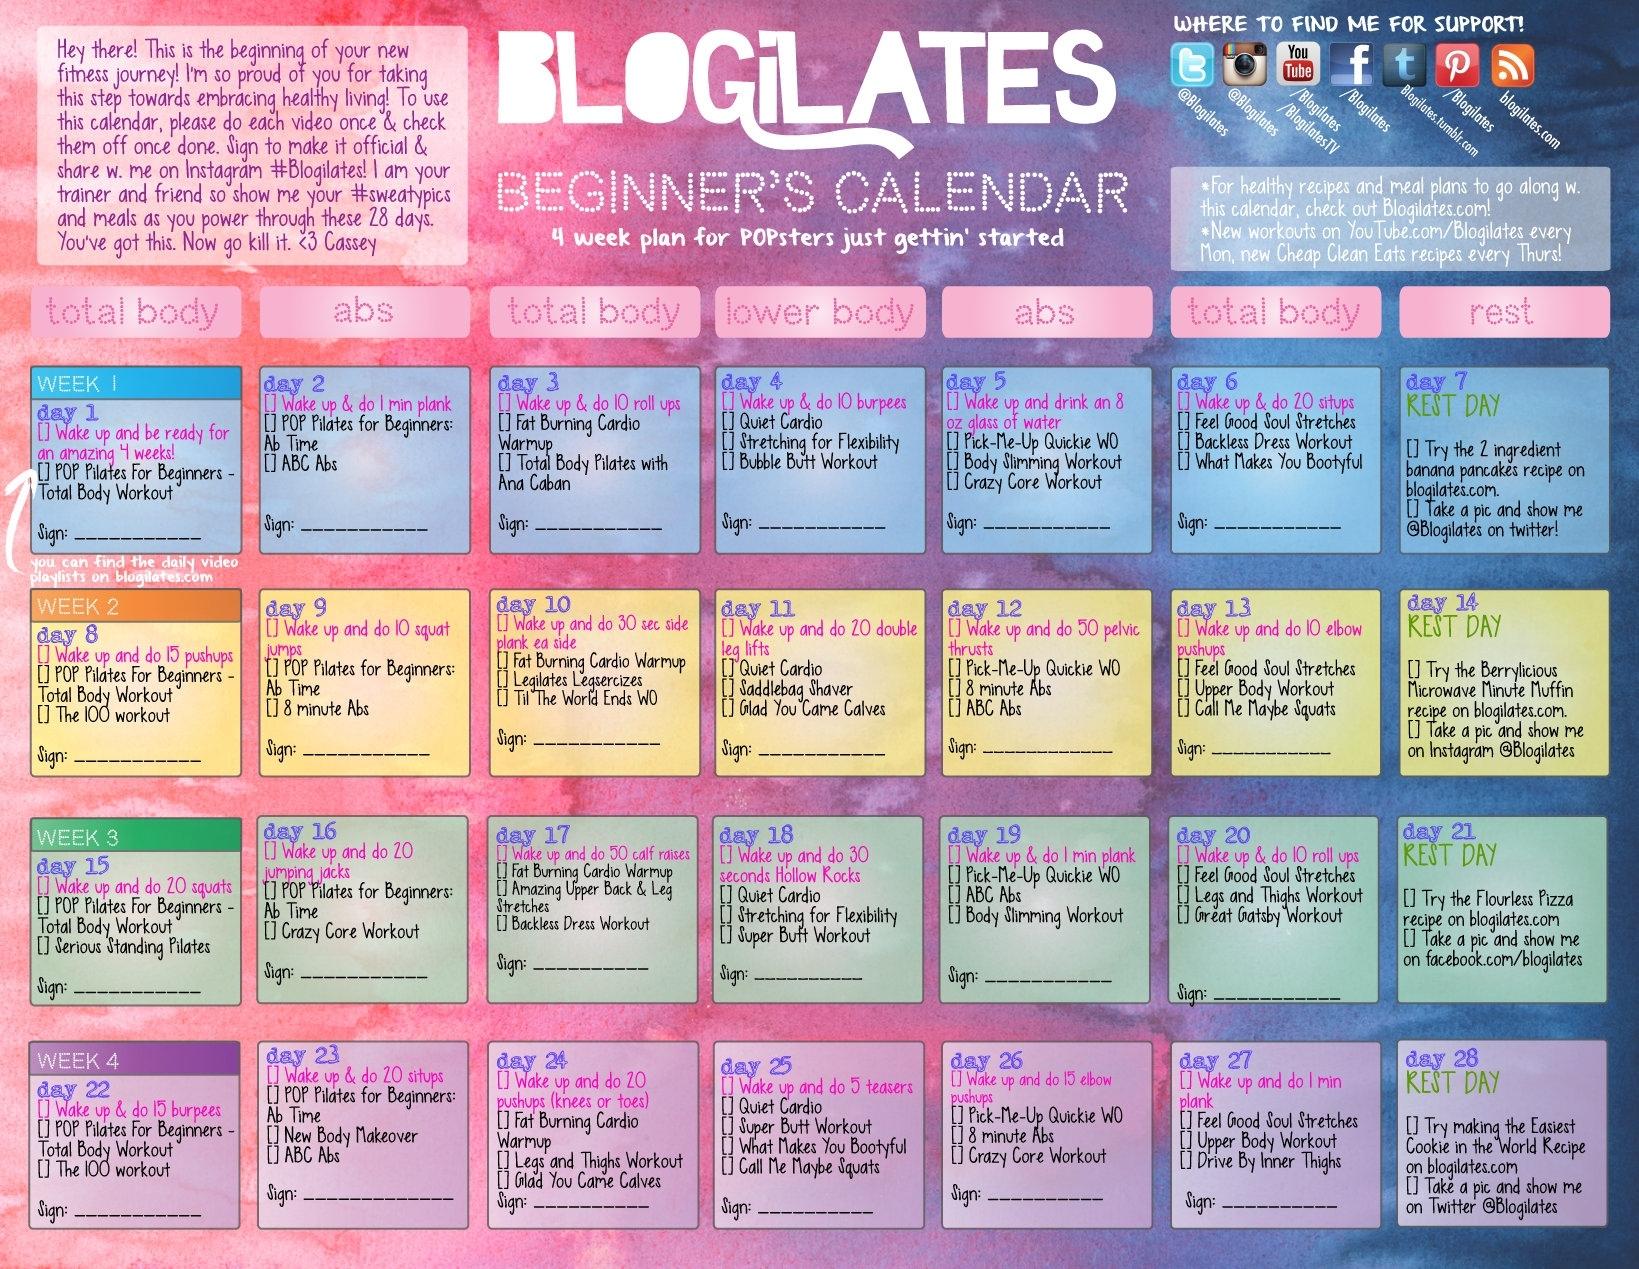 Pop Pilates For Beginners Calendar! – Blogilates Y Pant School Calendar